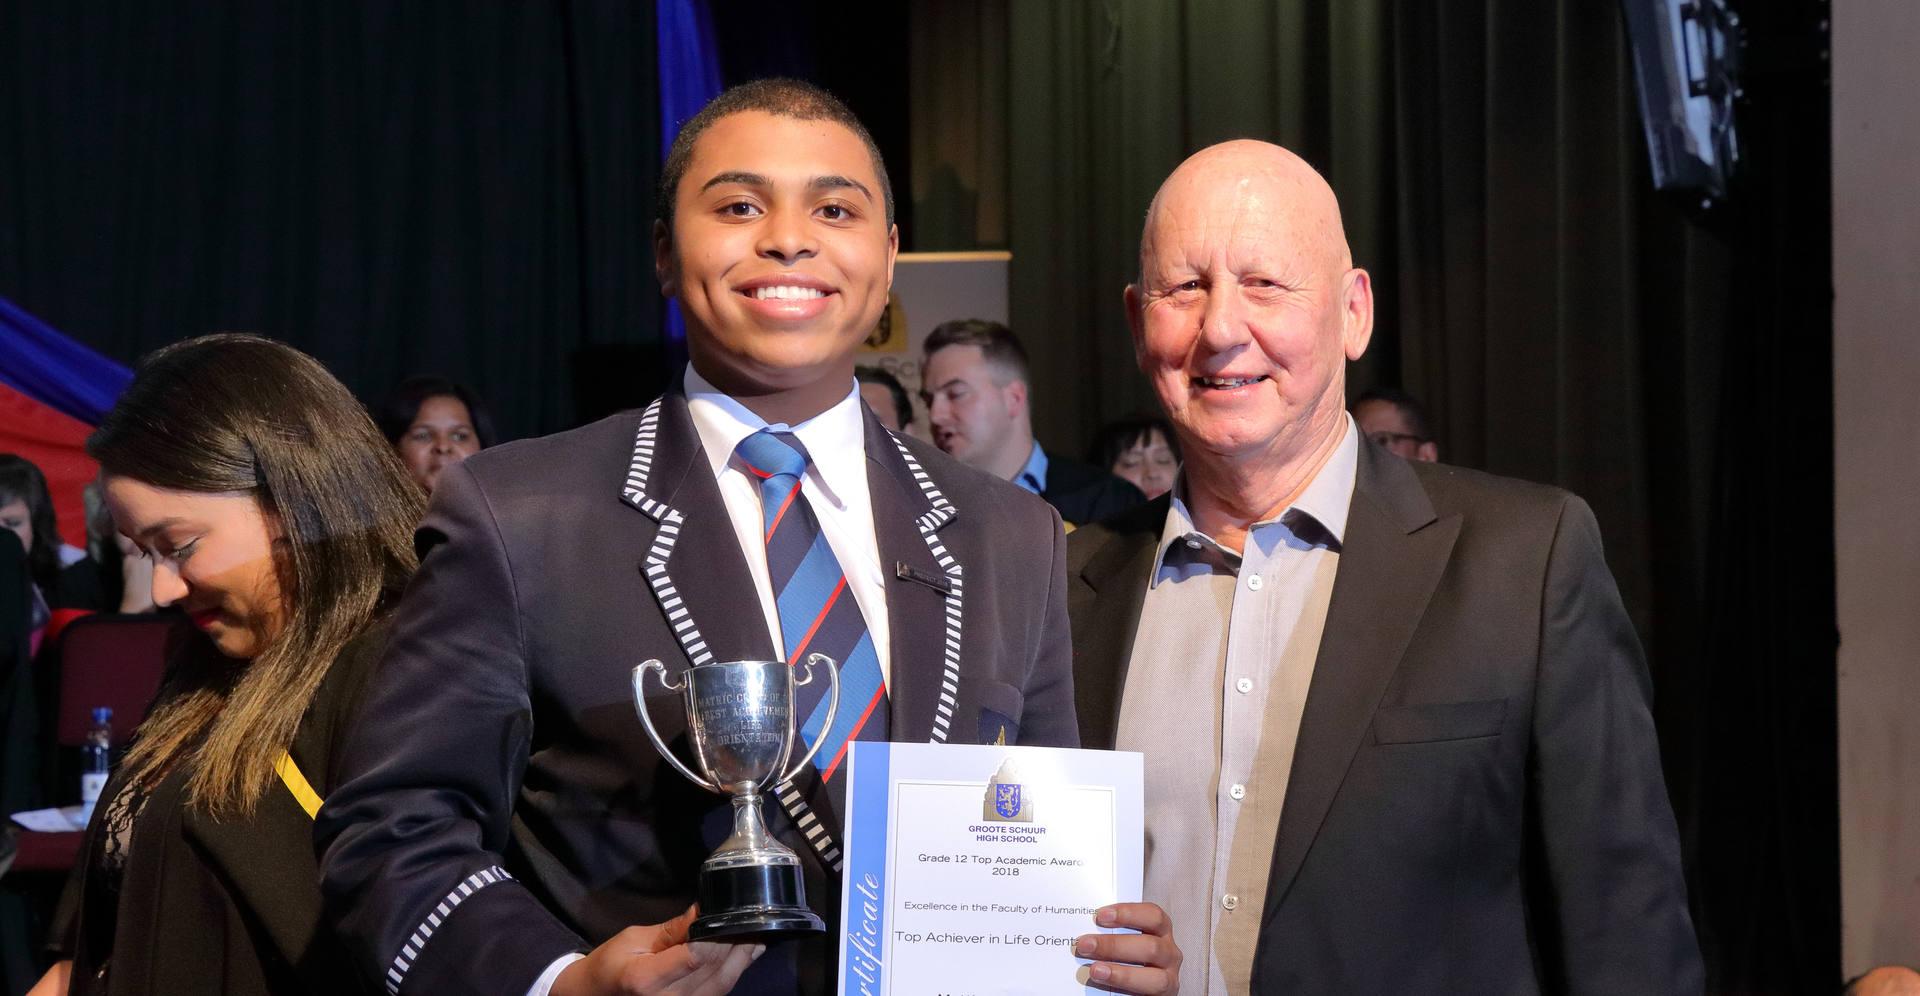 _M Gallant - Award for Academic Excellen